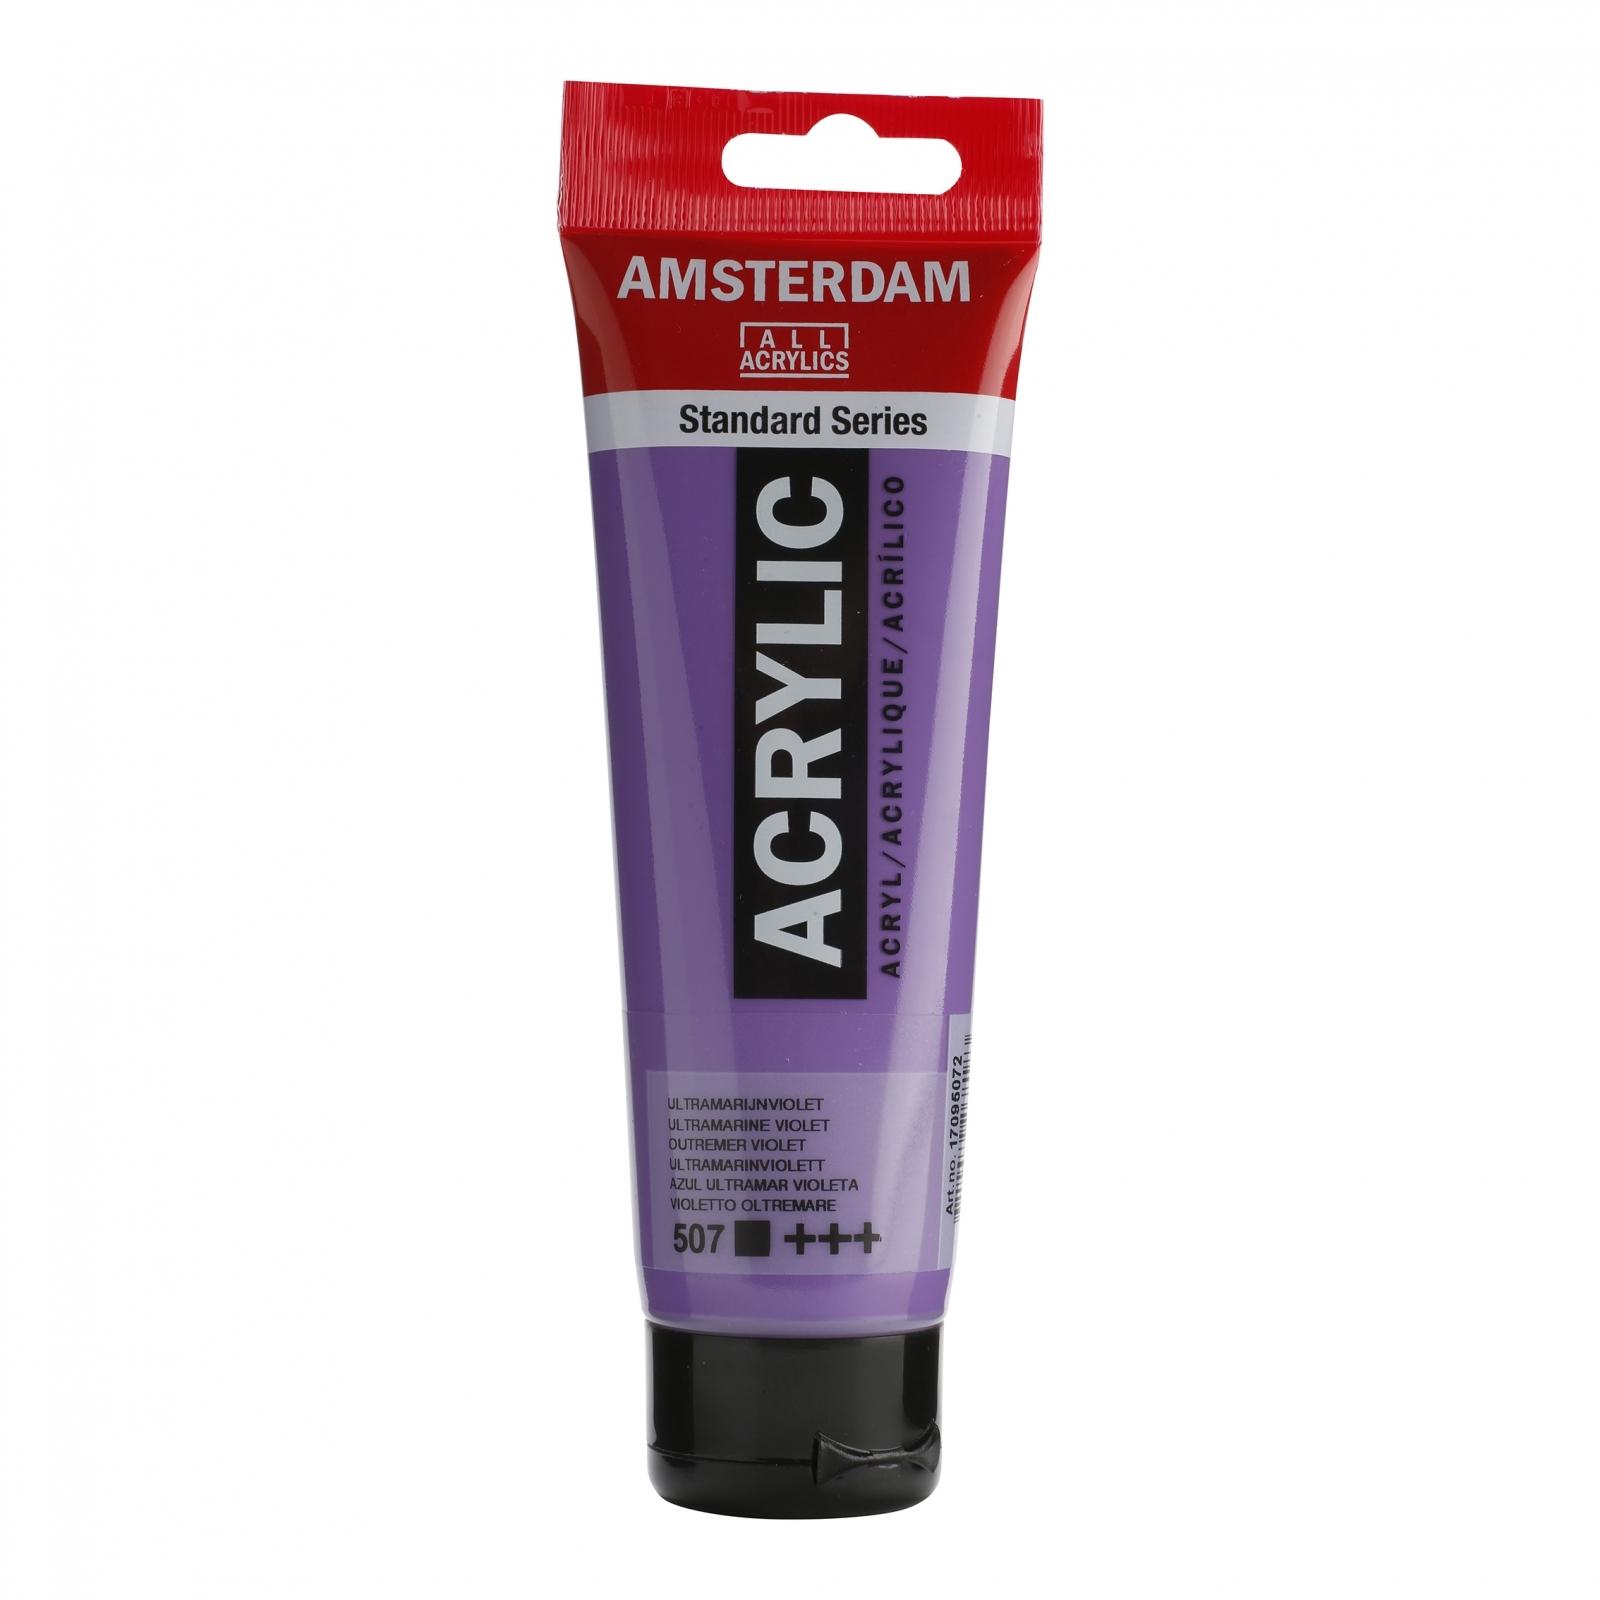 Tinta Acrílica Amsterdam Violeta Ultramarine 120ml (+++507) - Papelaria Botafogo